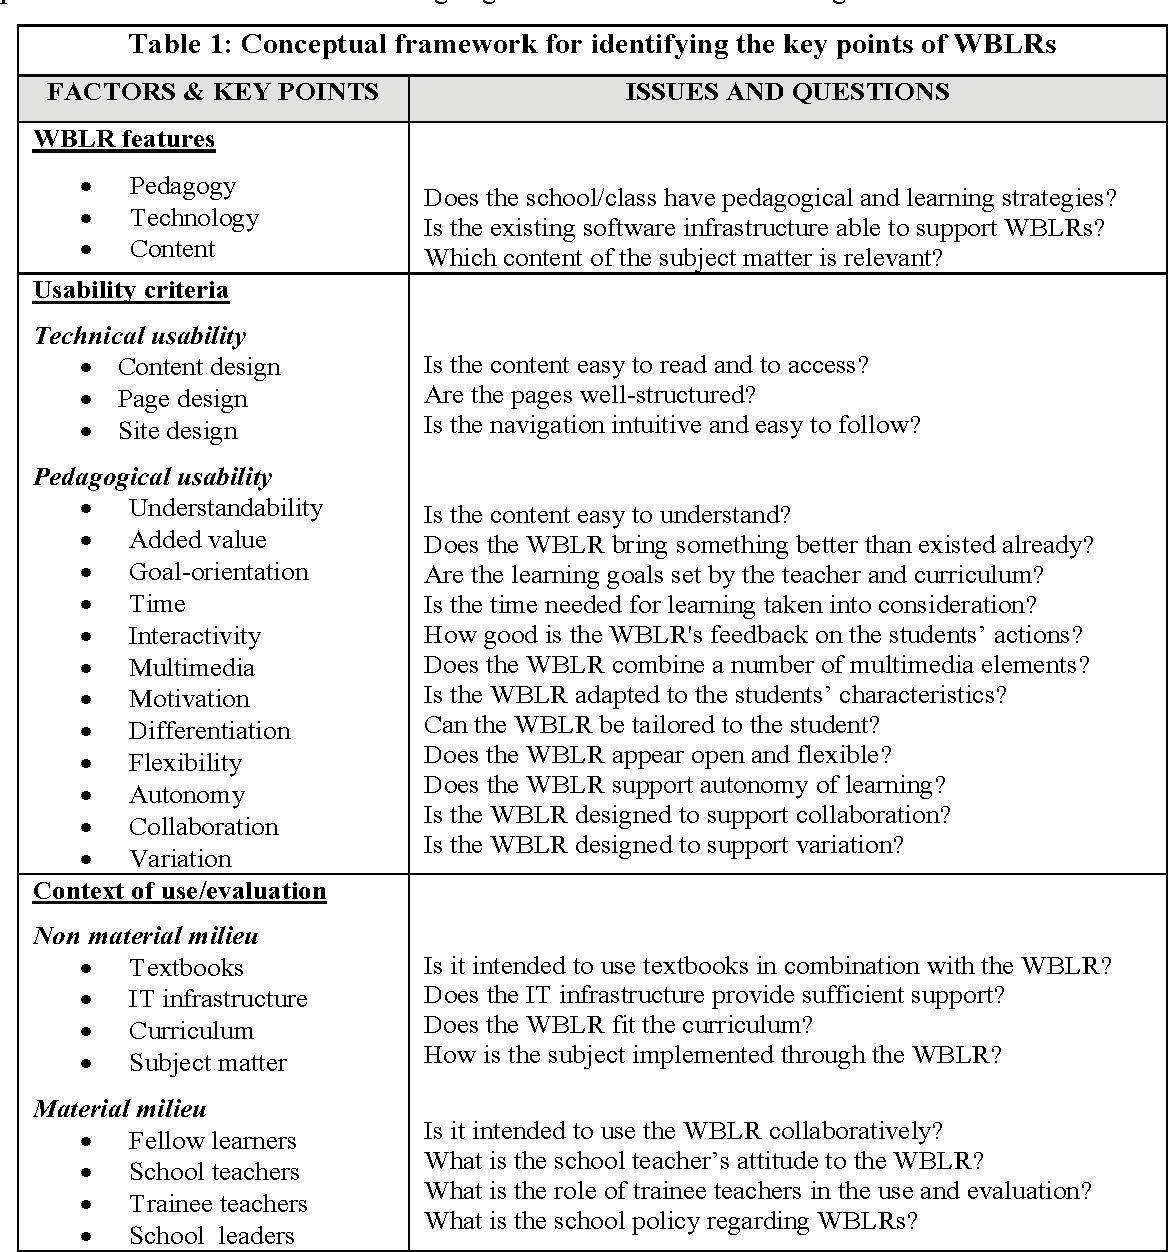 PDF] A Conceptual Framework for Using and Evaluating Web